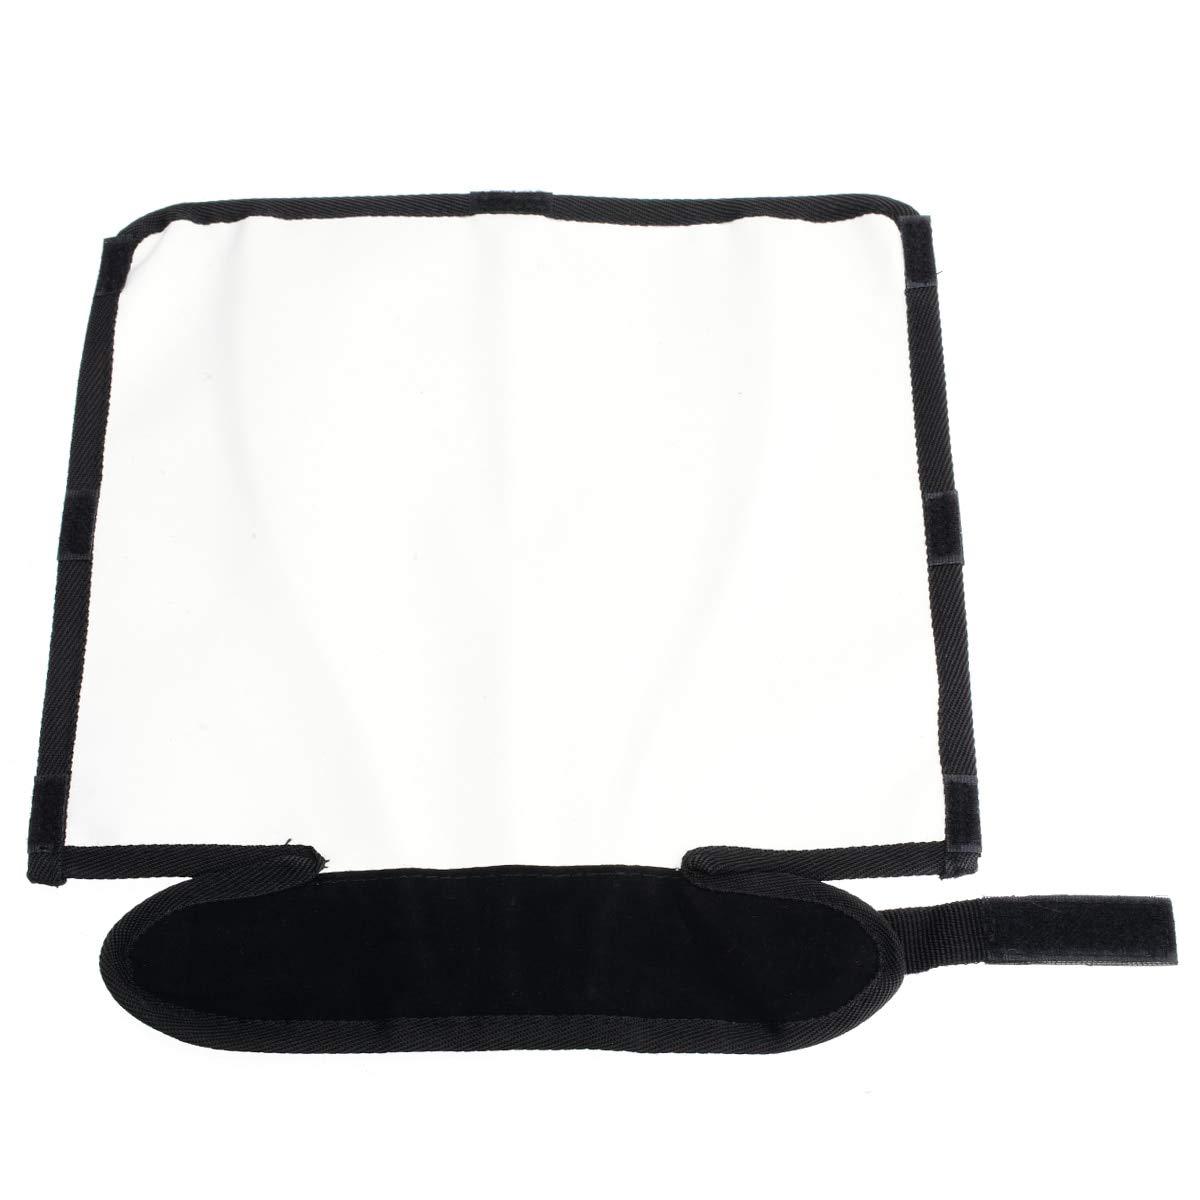 FENGYI KEJI 1pc Foldable Max 67% OFF low-pricing Speedlight Reflector Snoo Flash Softbox